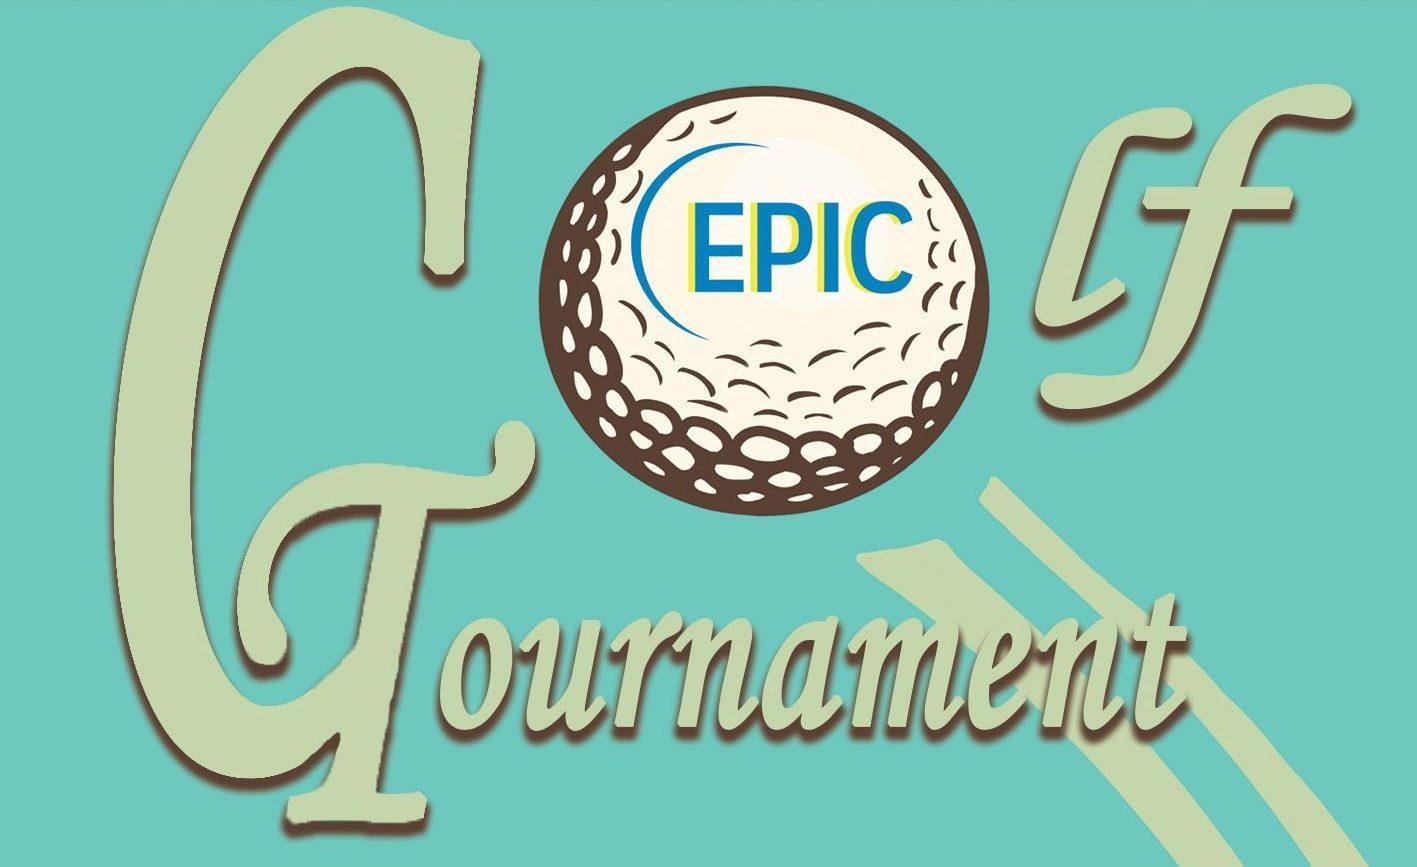 Golf Tournament Poster FRONT 2021 RBG e1629347072433